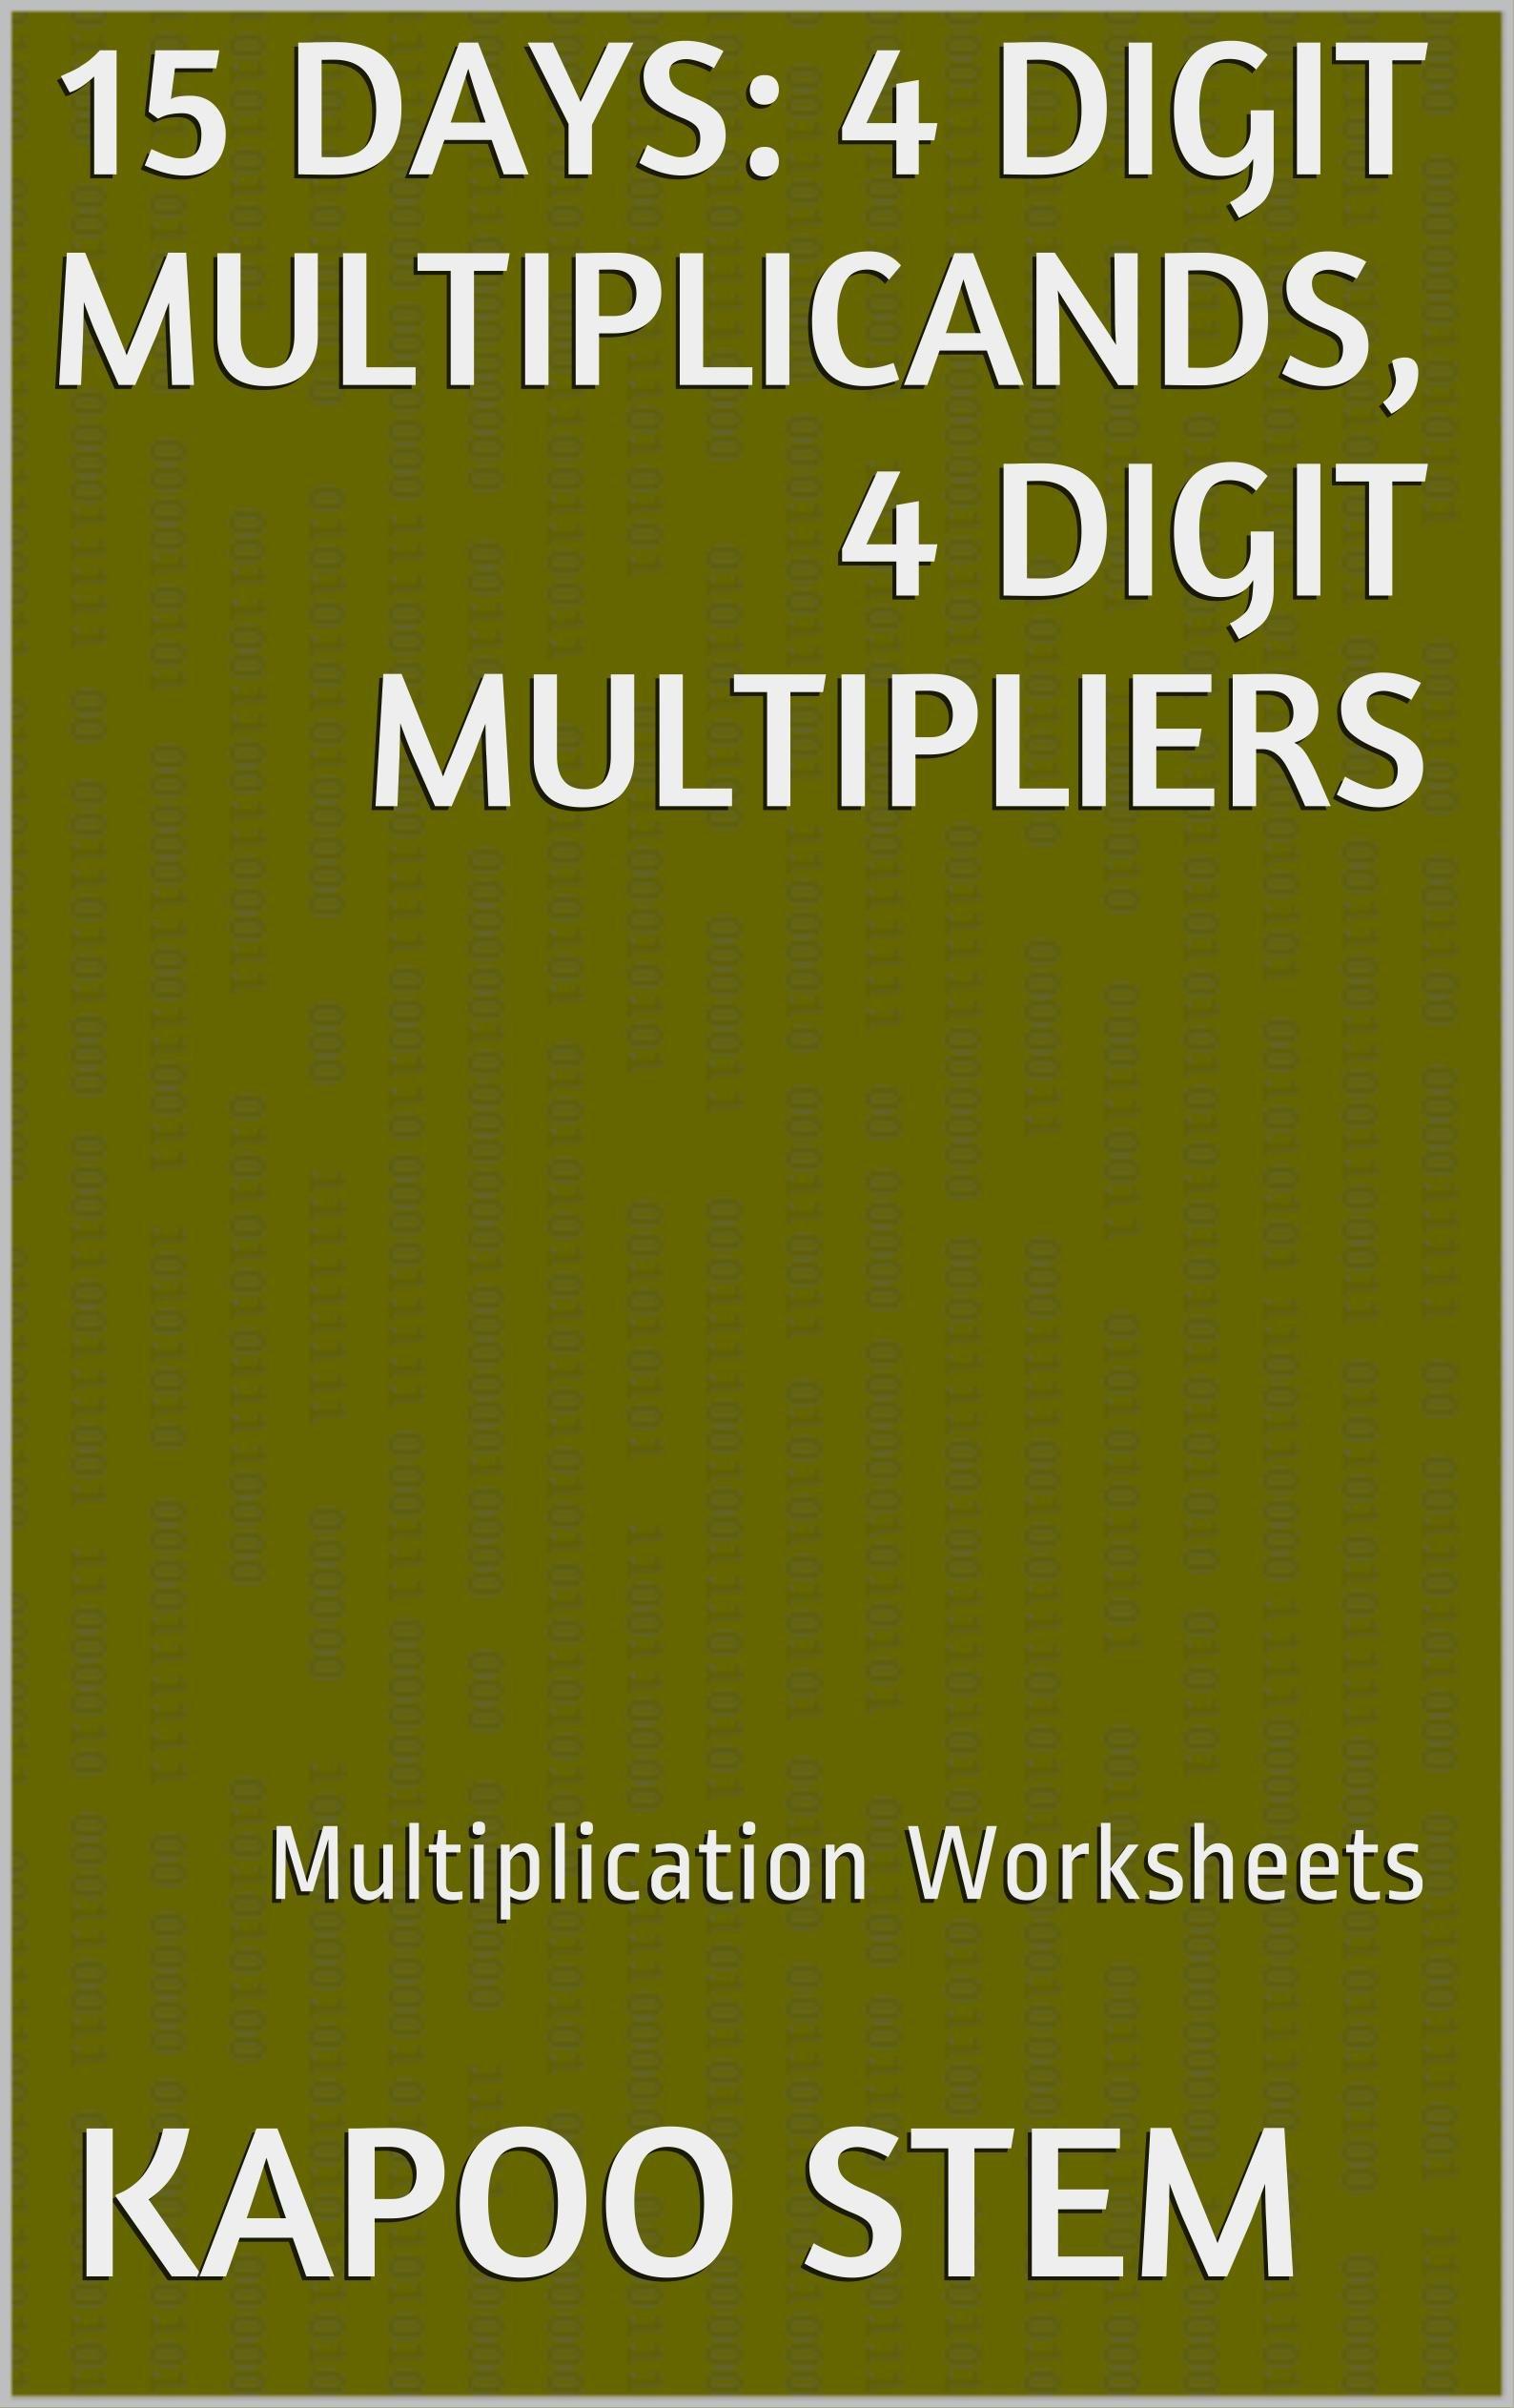 15 Multiplication Worksheets With 4 Digit Multiplicands 4